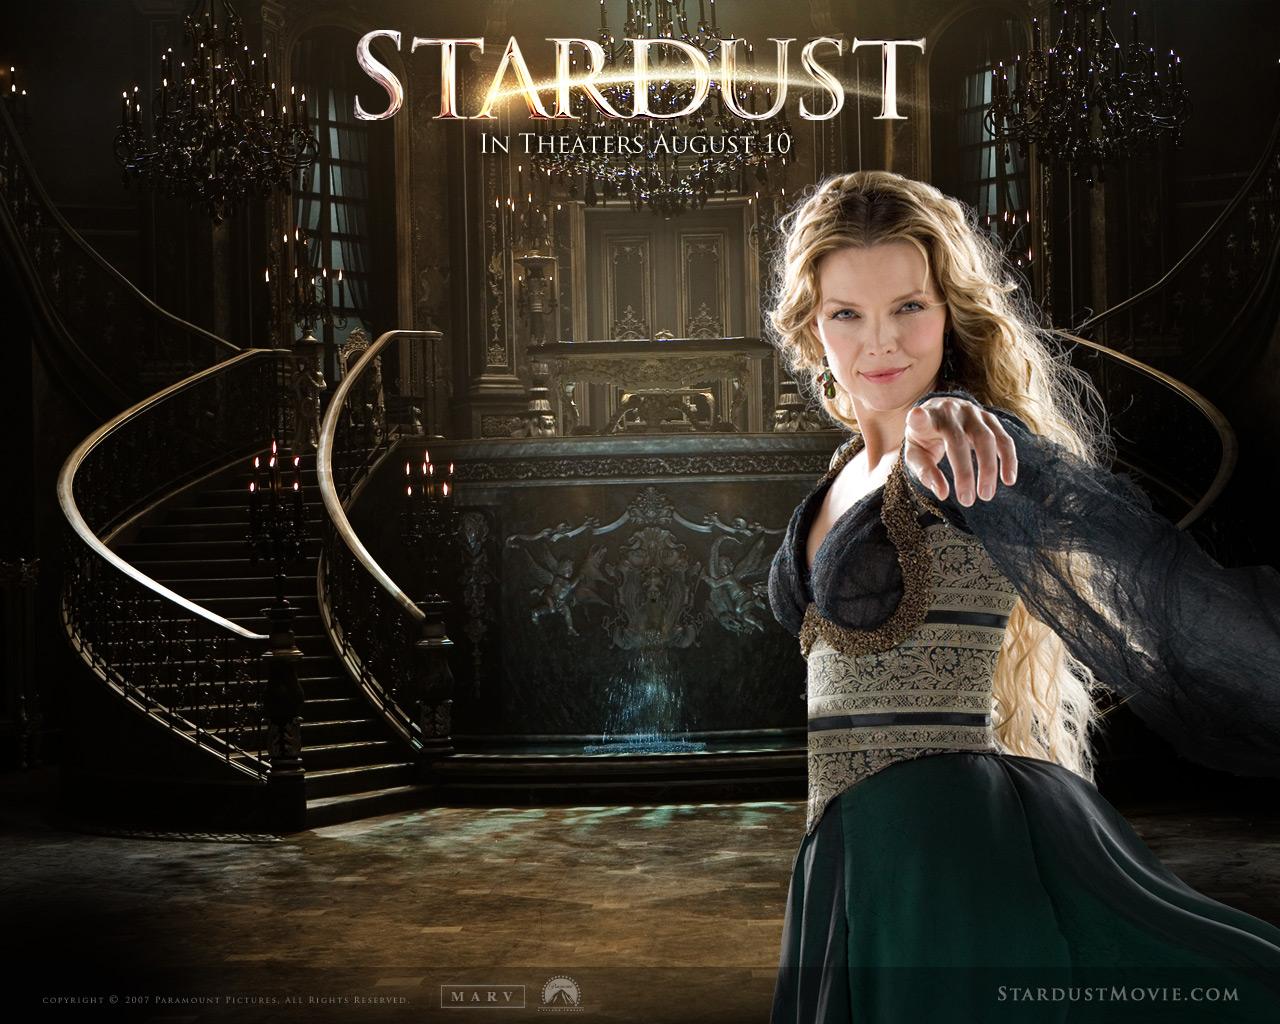 Stardust-movies-323083_1280_1024